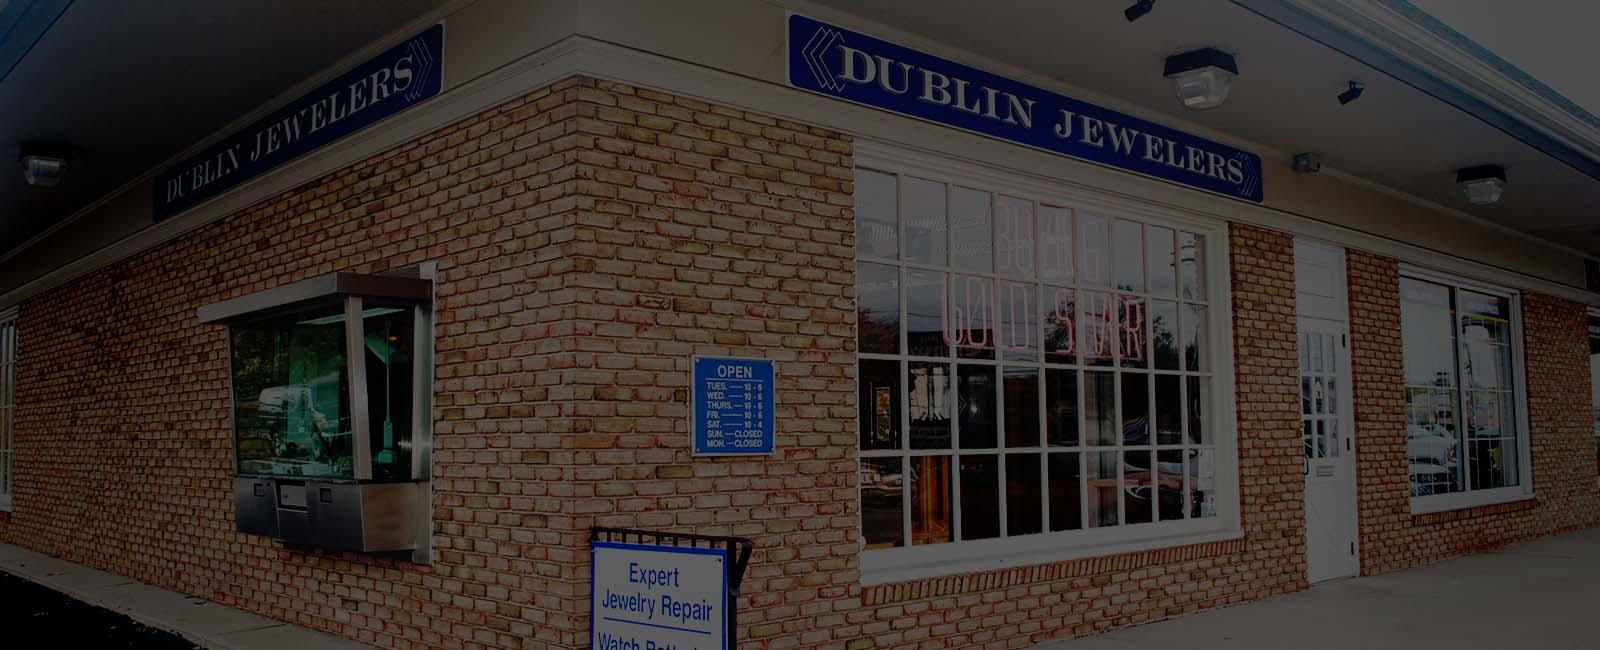 Dublin Jewelers